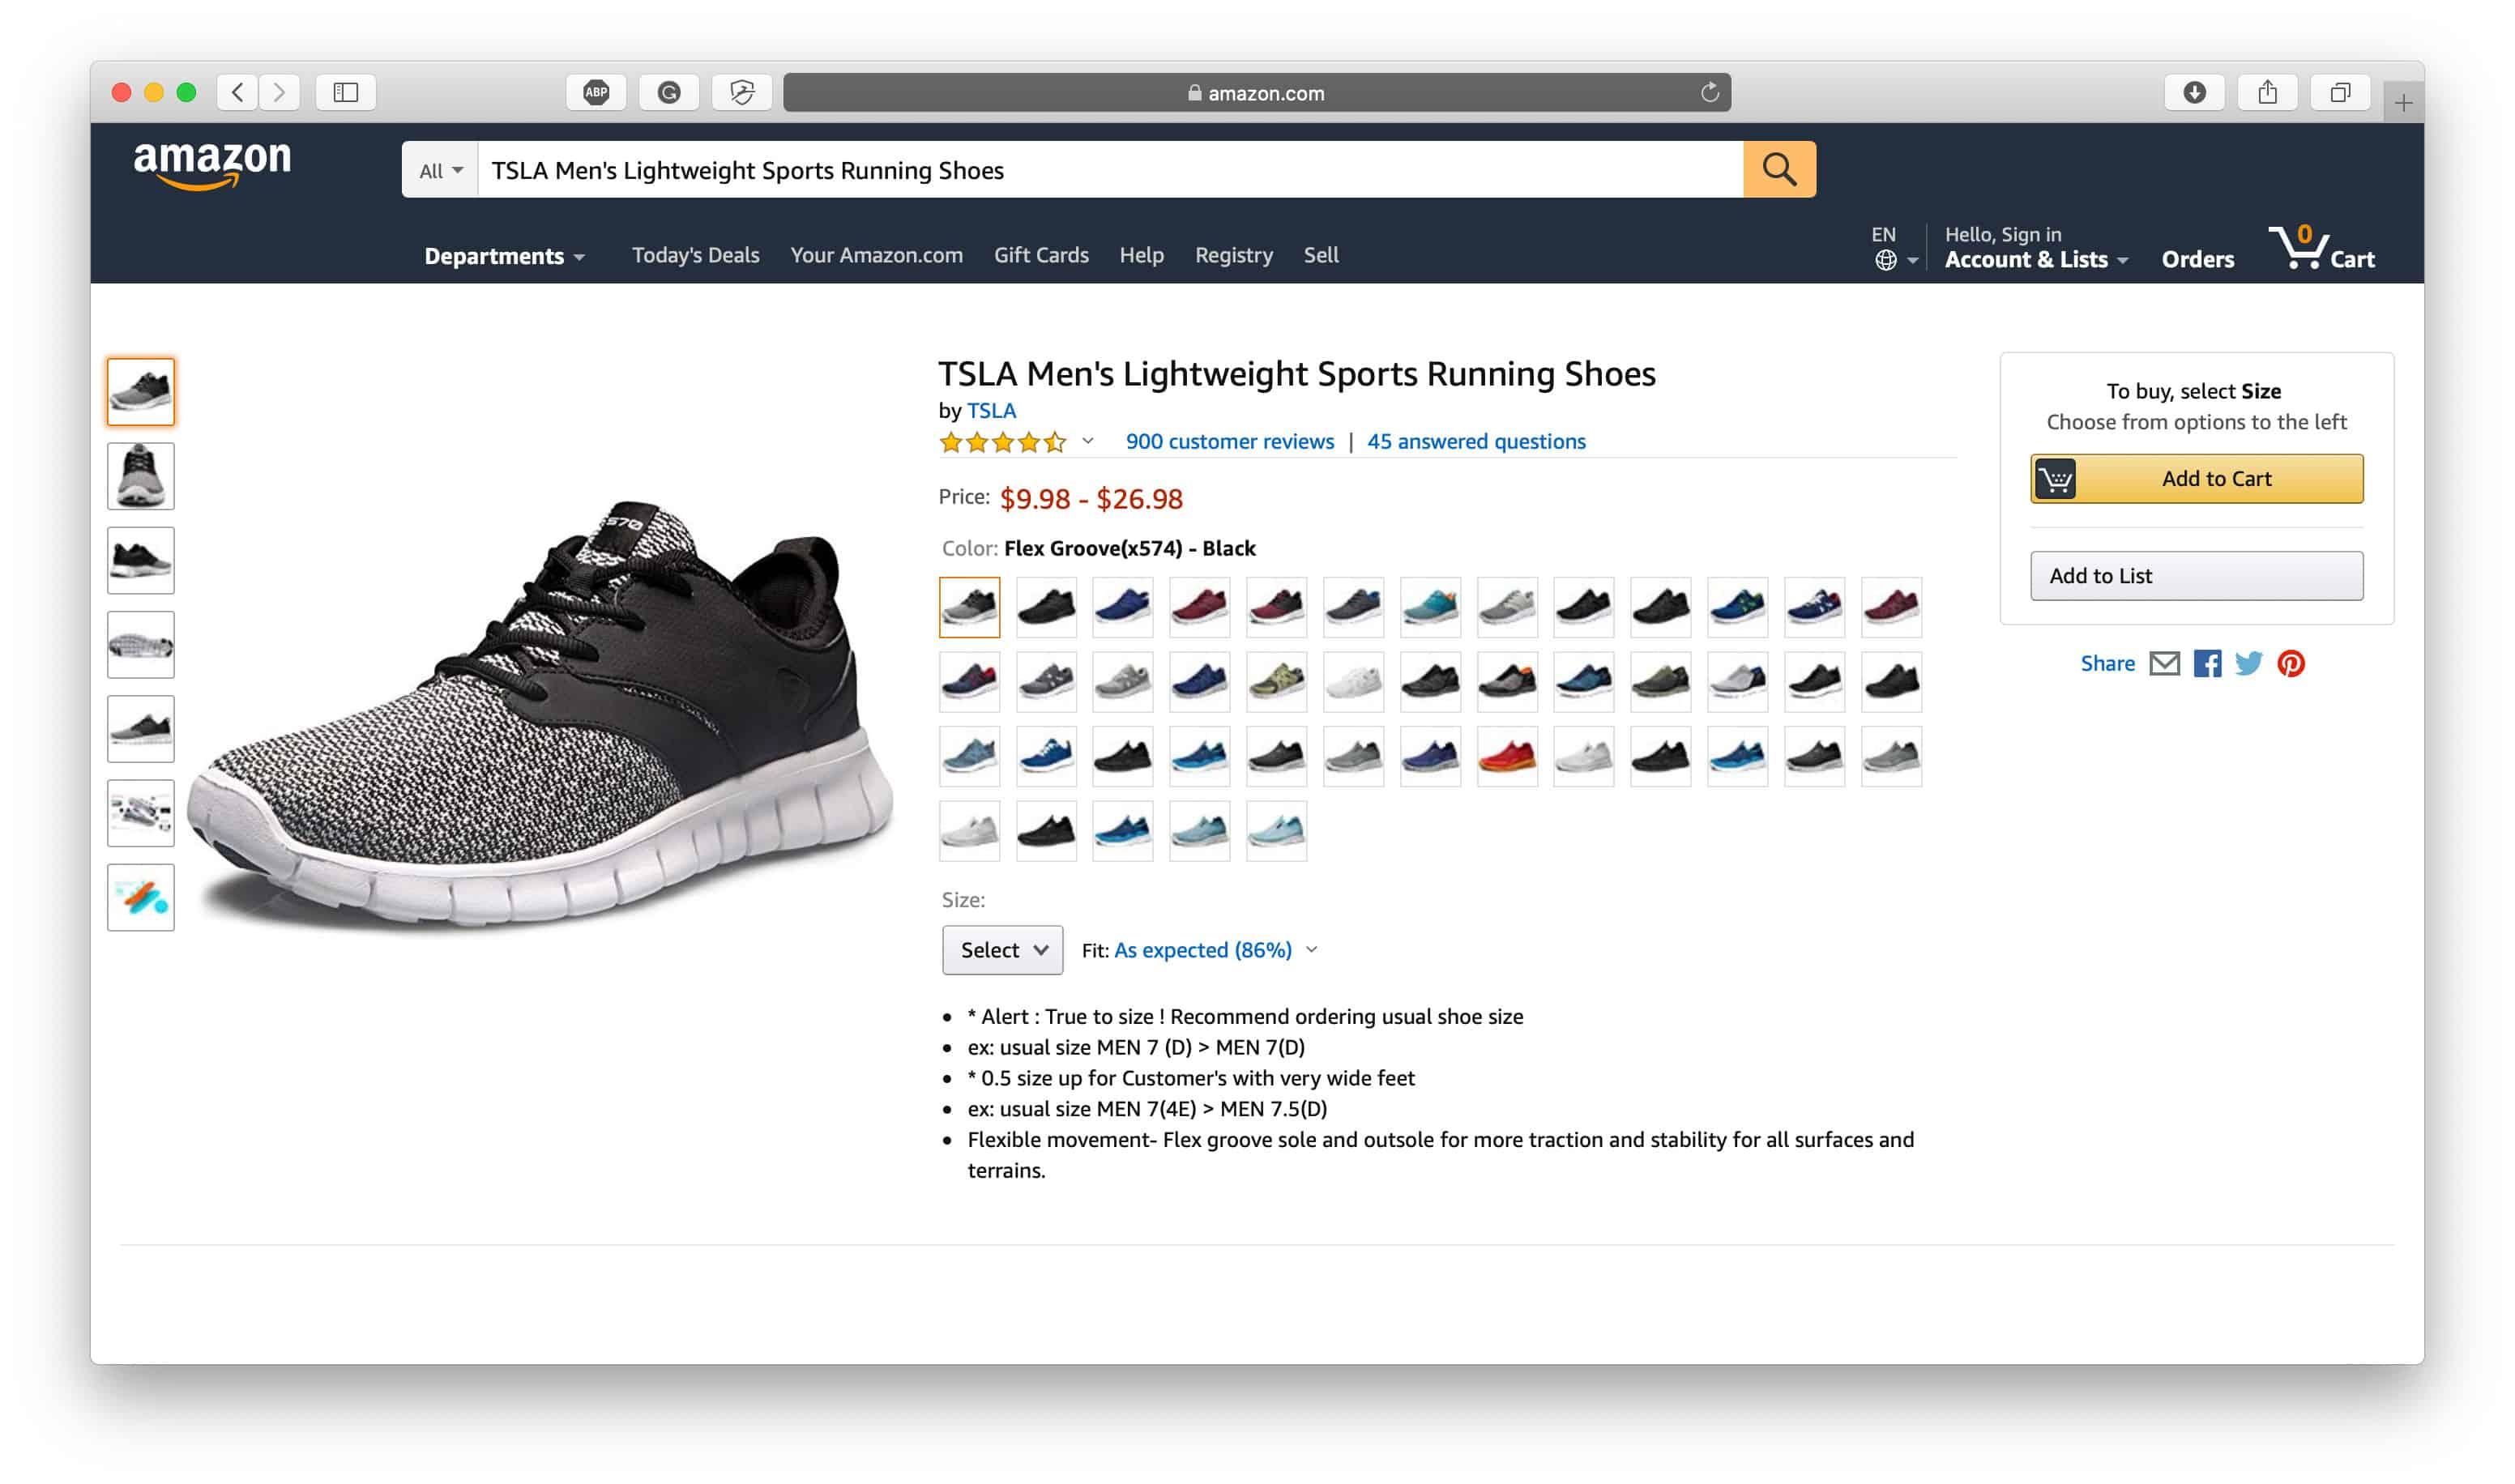 Amazon Product Image Example